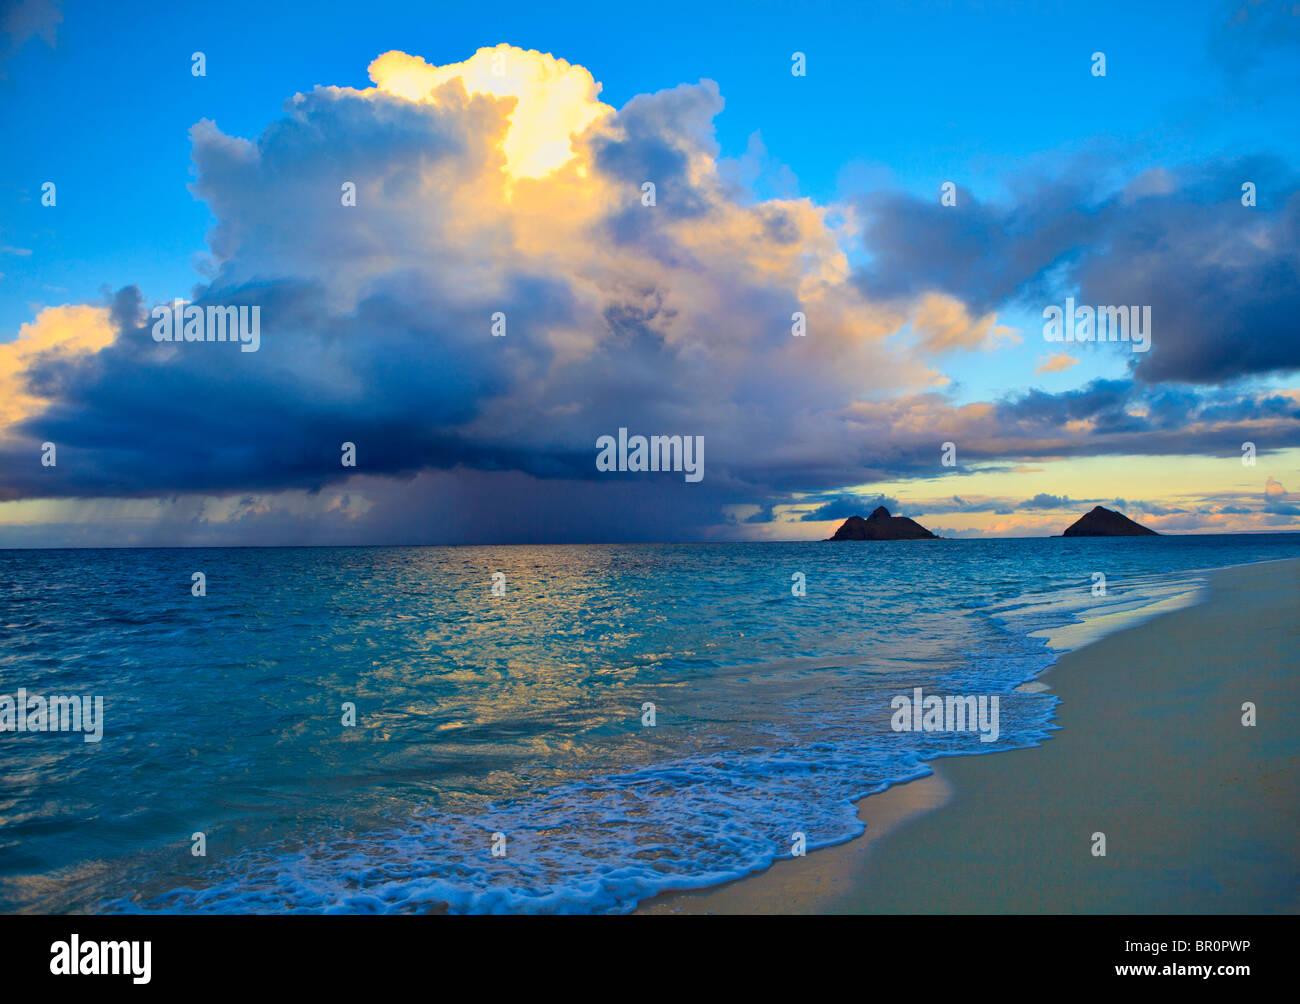 late afternoon offshore rainstorm at lanikai beach, hawaii - Stock Image